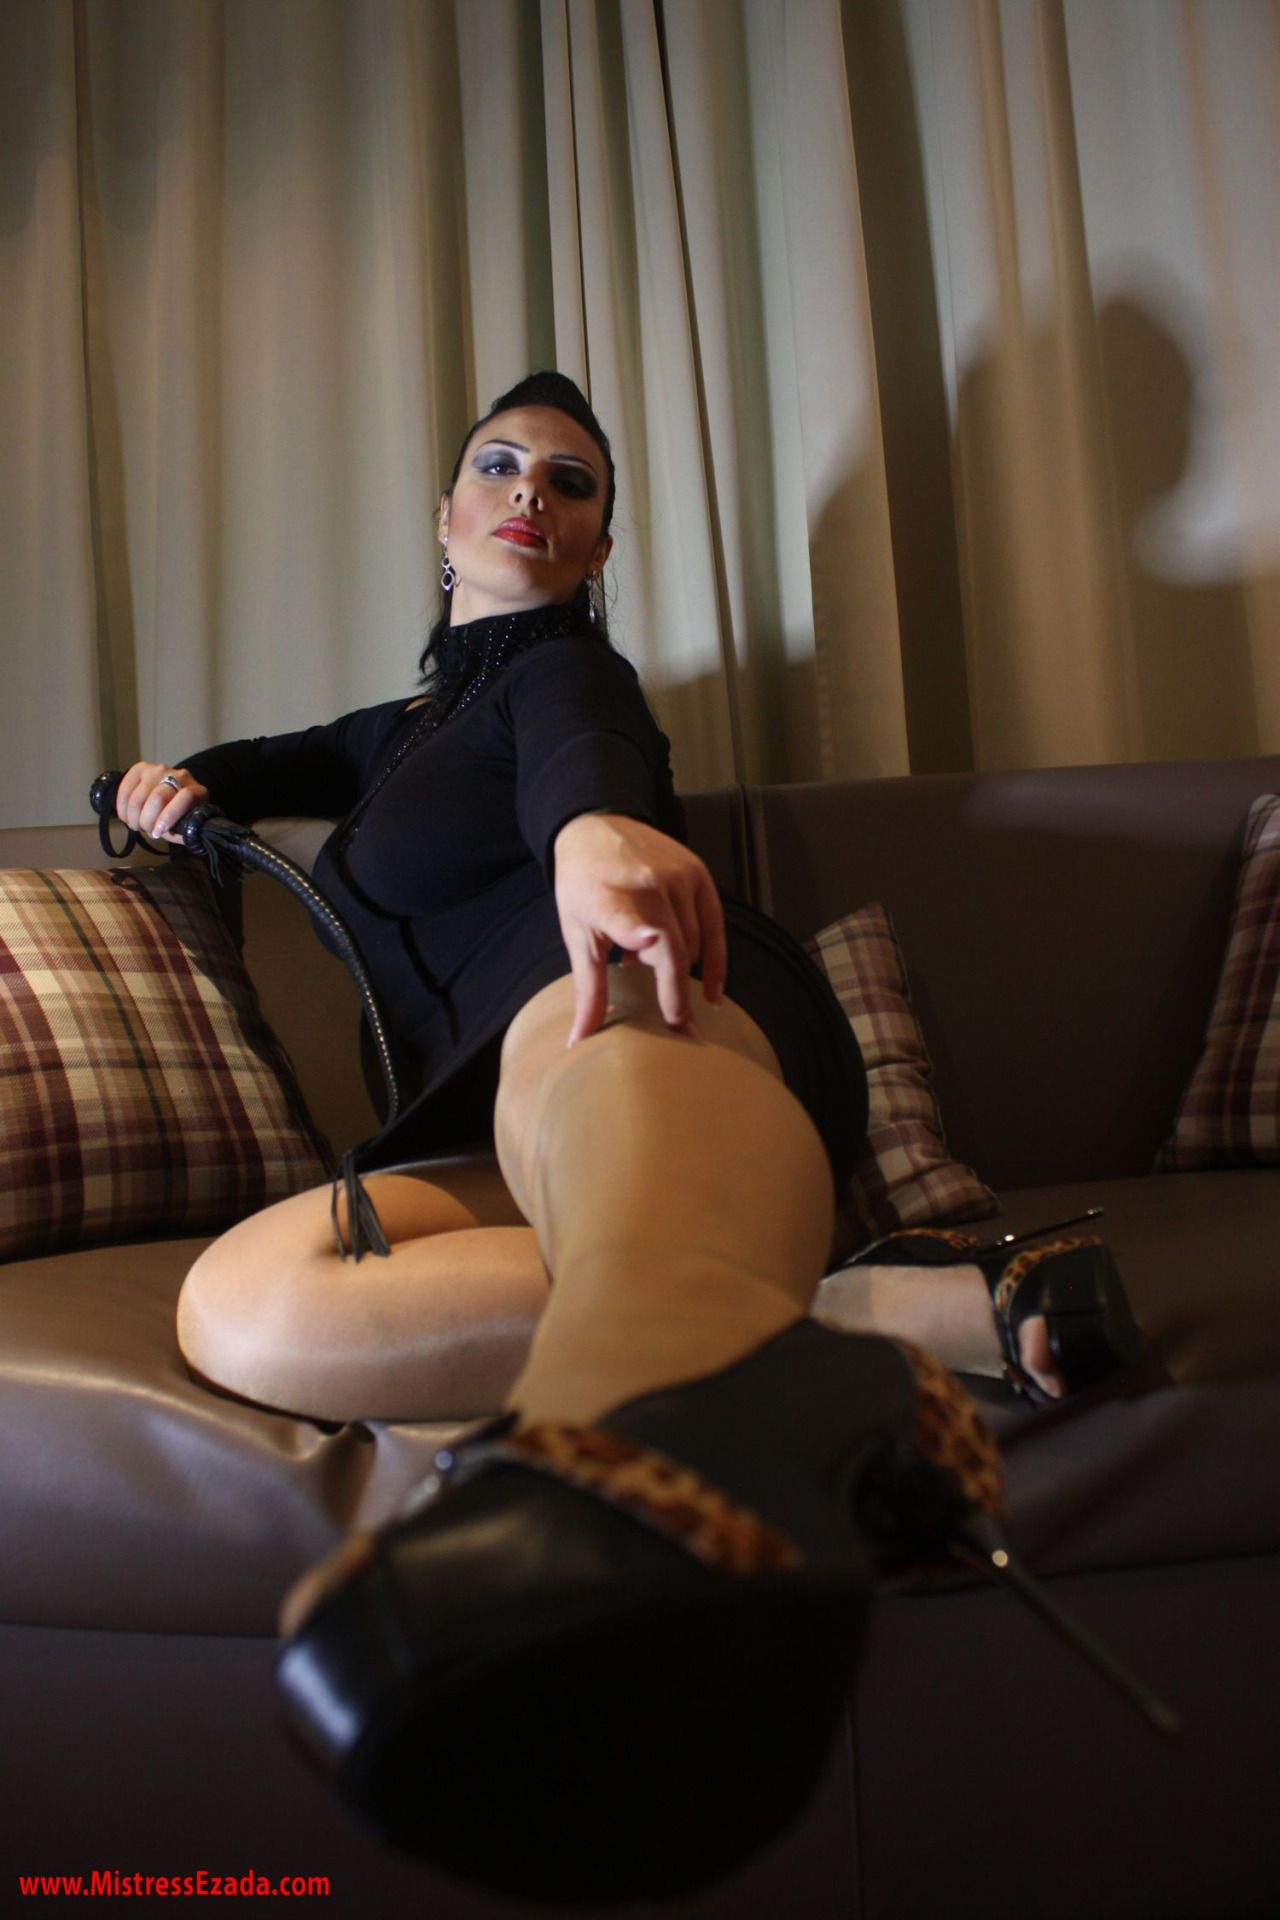 Gallery anastasia obrien mistress femdom